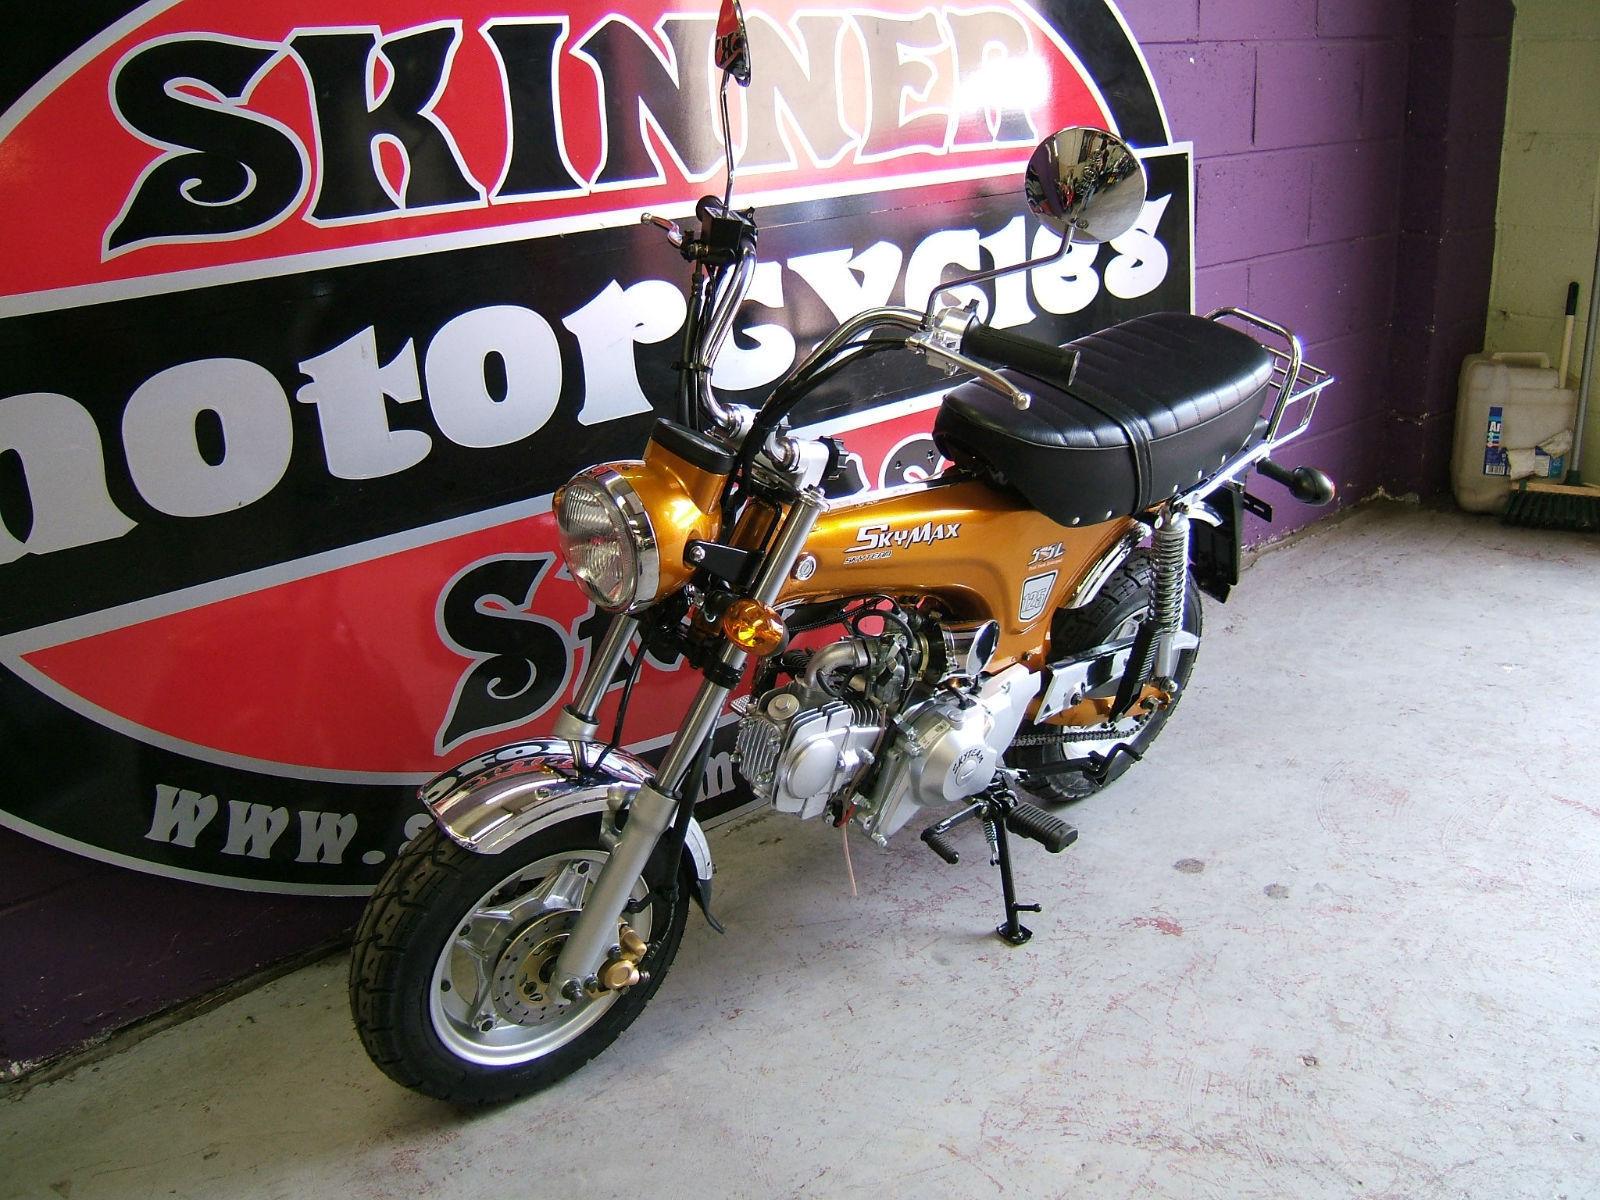 skyteam skymax 125 brand new learner legal honda dax style 125cc gold. Black Bedroom Furniture Sets. Home Design Ideas